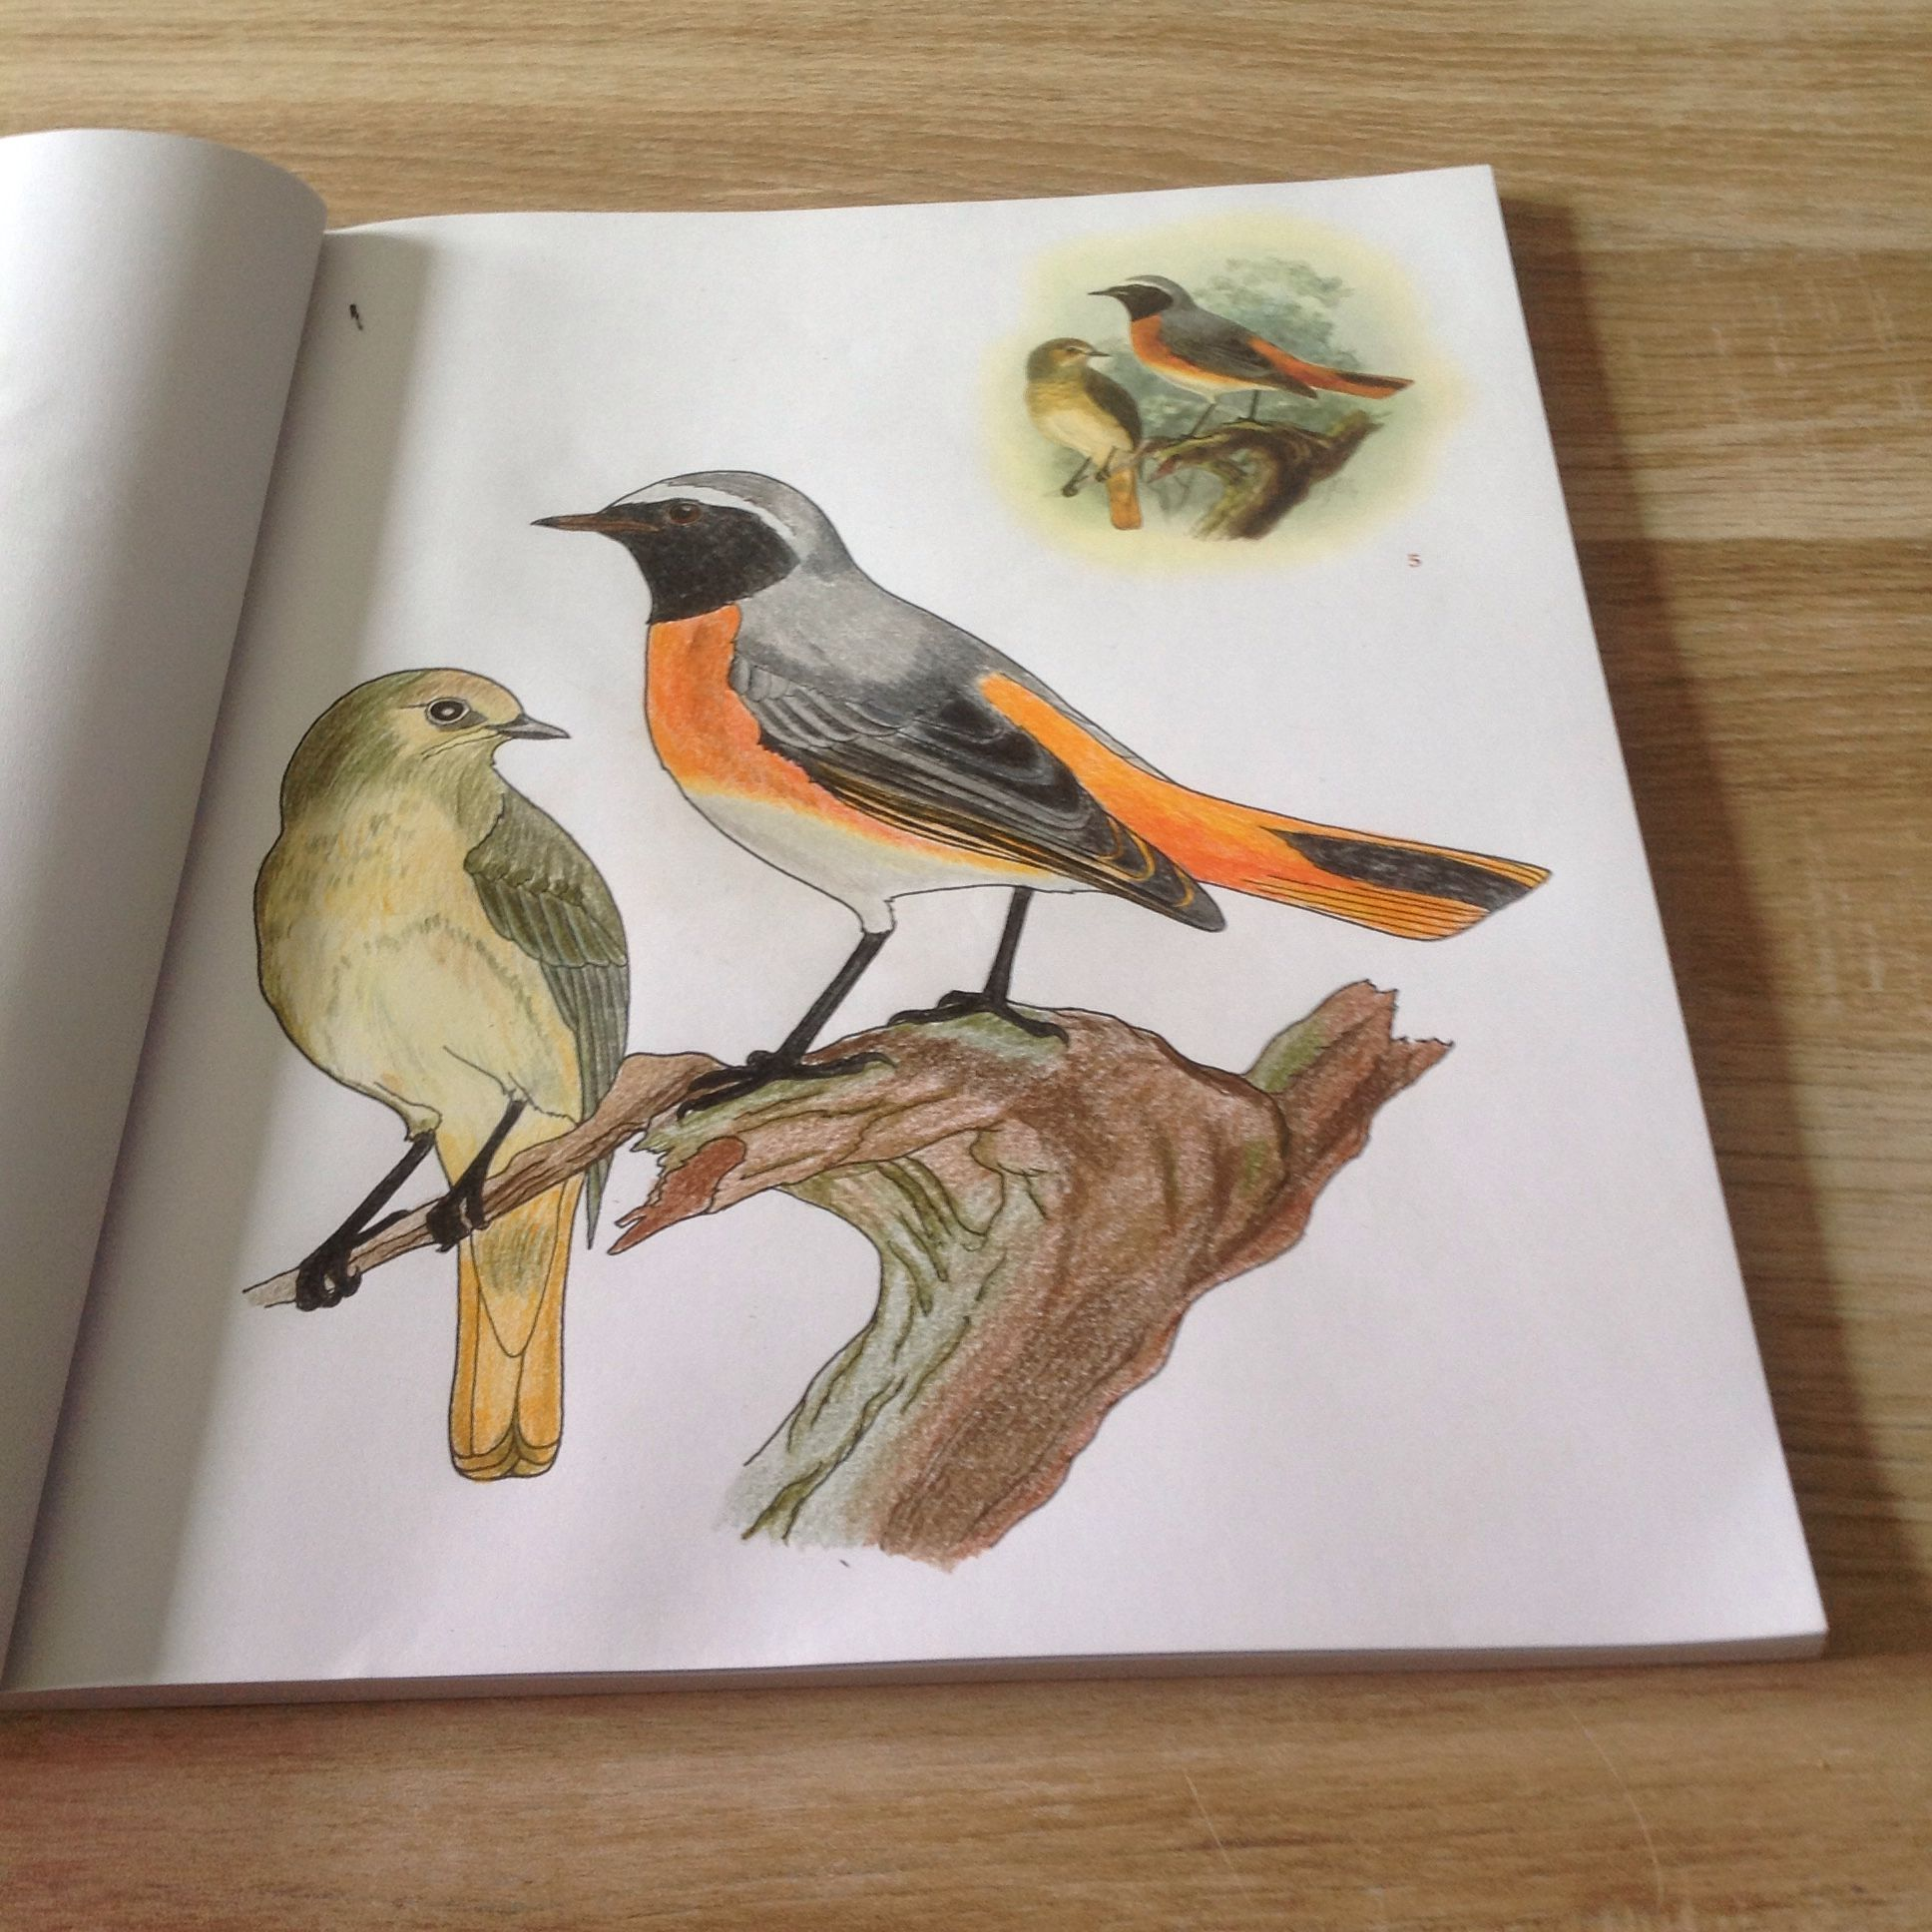 Vogels Kleuren Faber Castell Polychromos Kleuren Kleurboek Kleurplaten